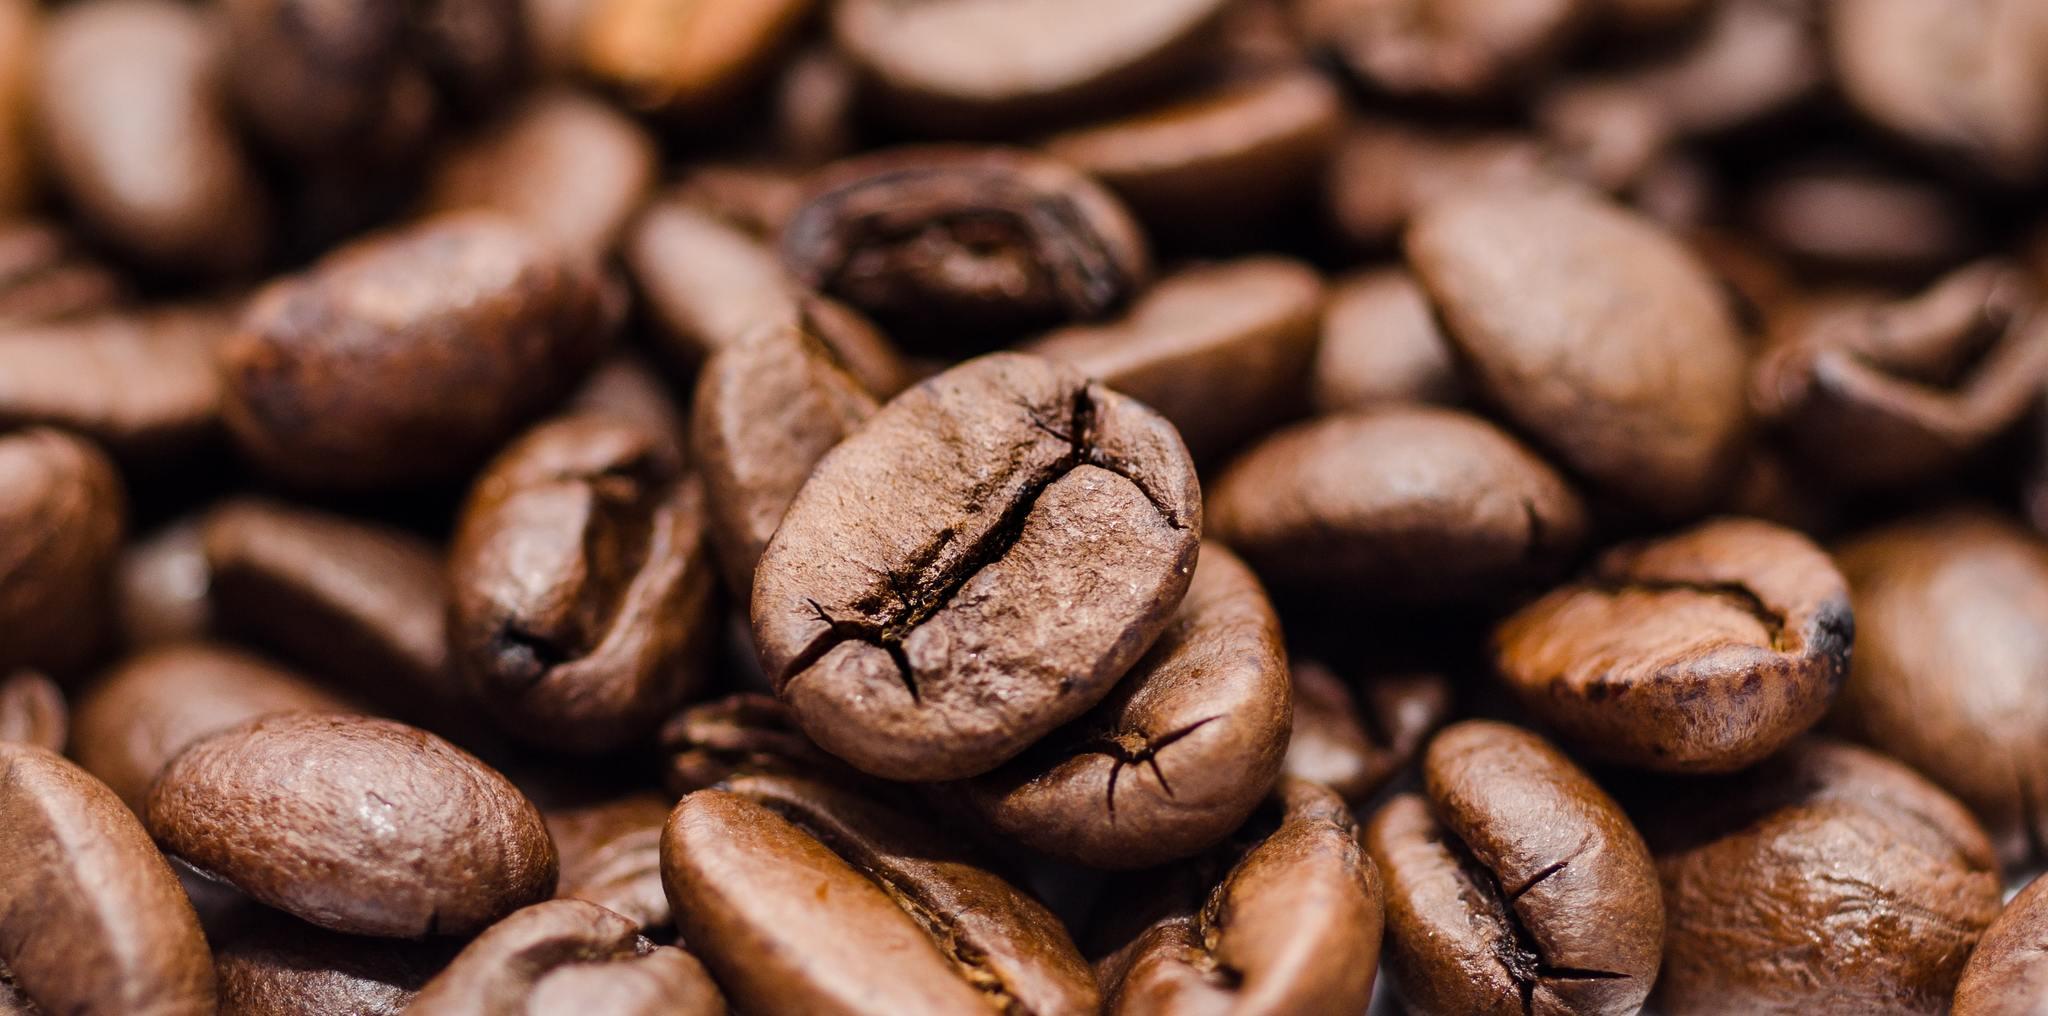 Топ-7 песен про кофе